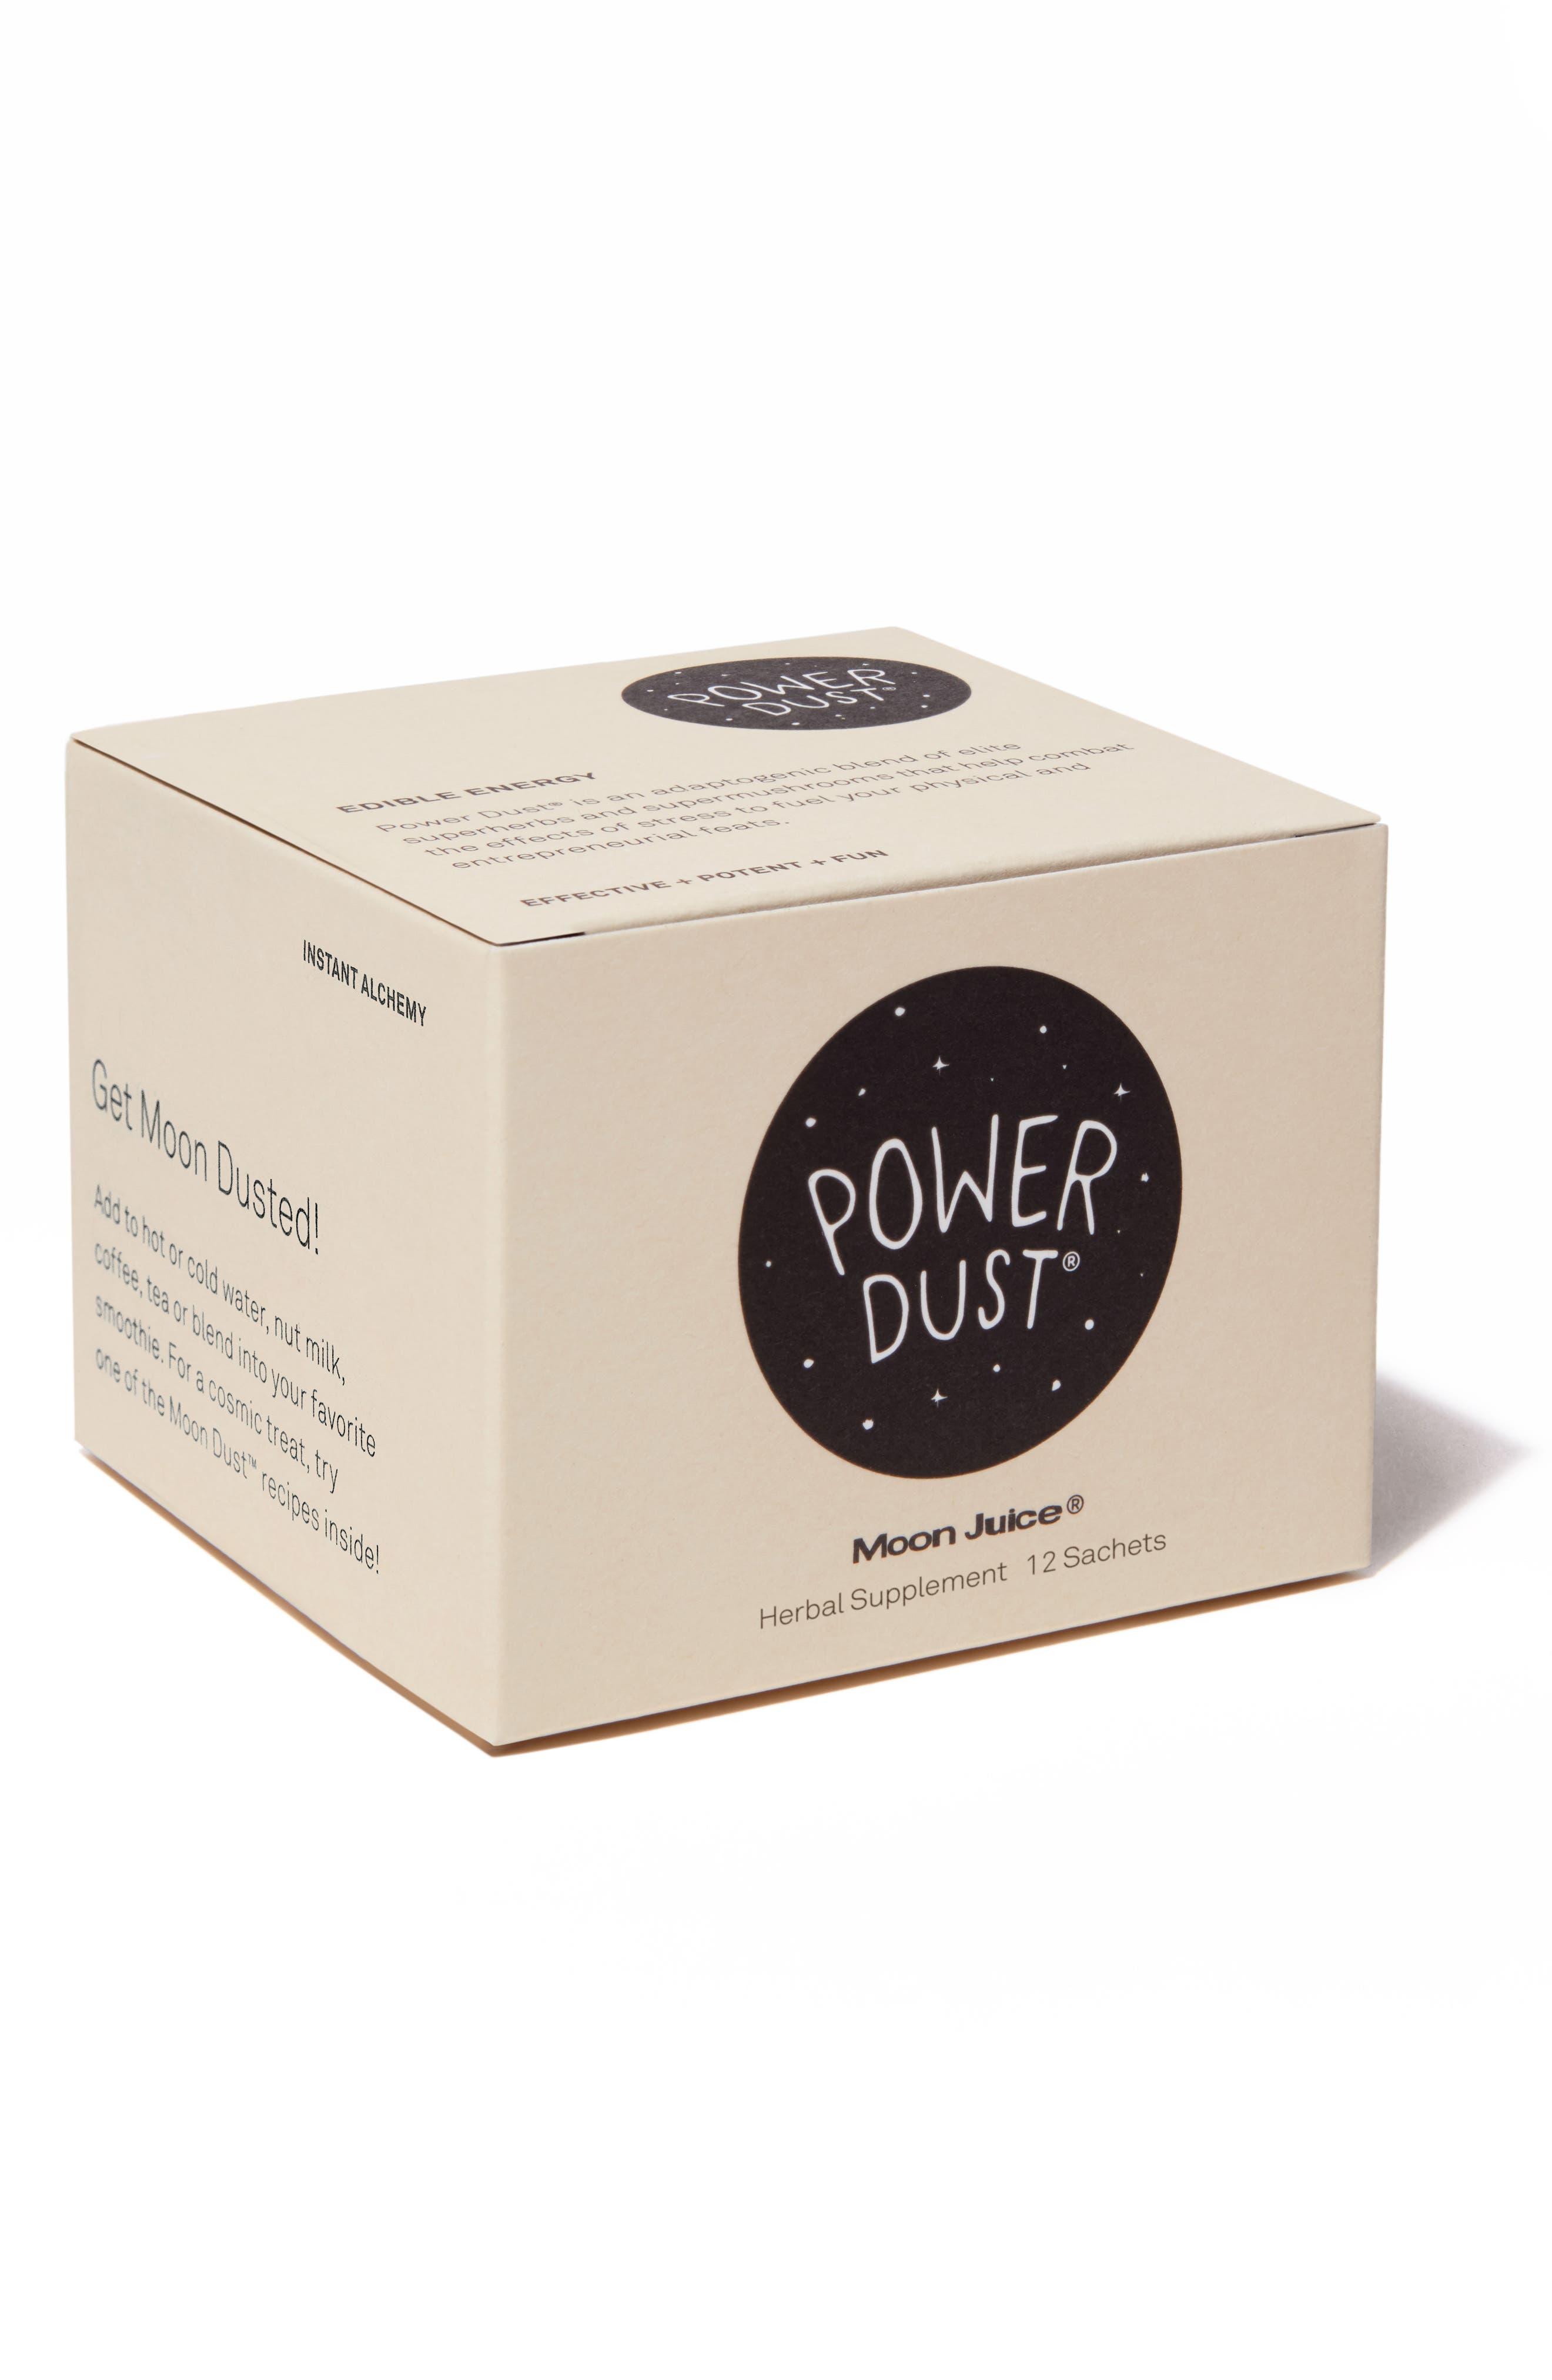 Alternate Image 1 Selected - Moon Juice Power Dust® Sachet Box